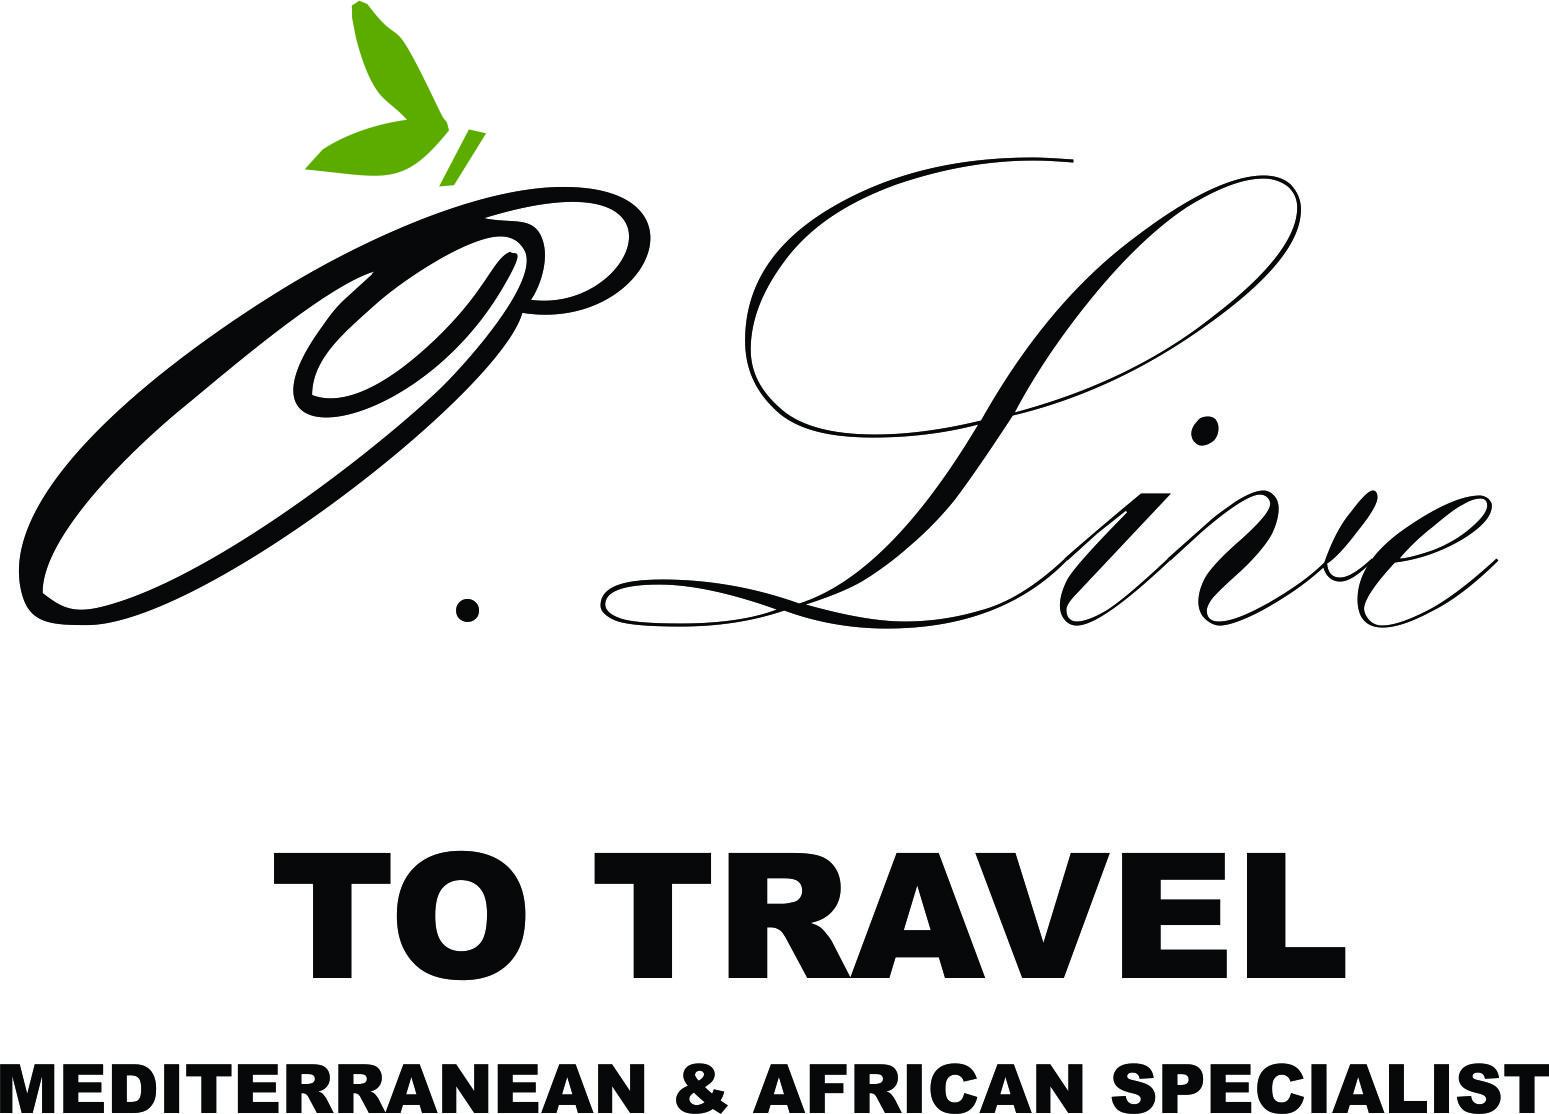 O Live to travel mediterranean & african Specialist logo - thin